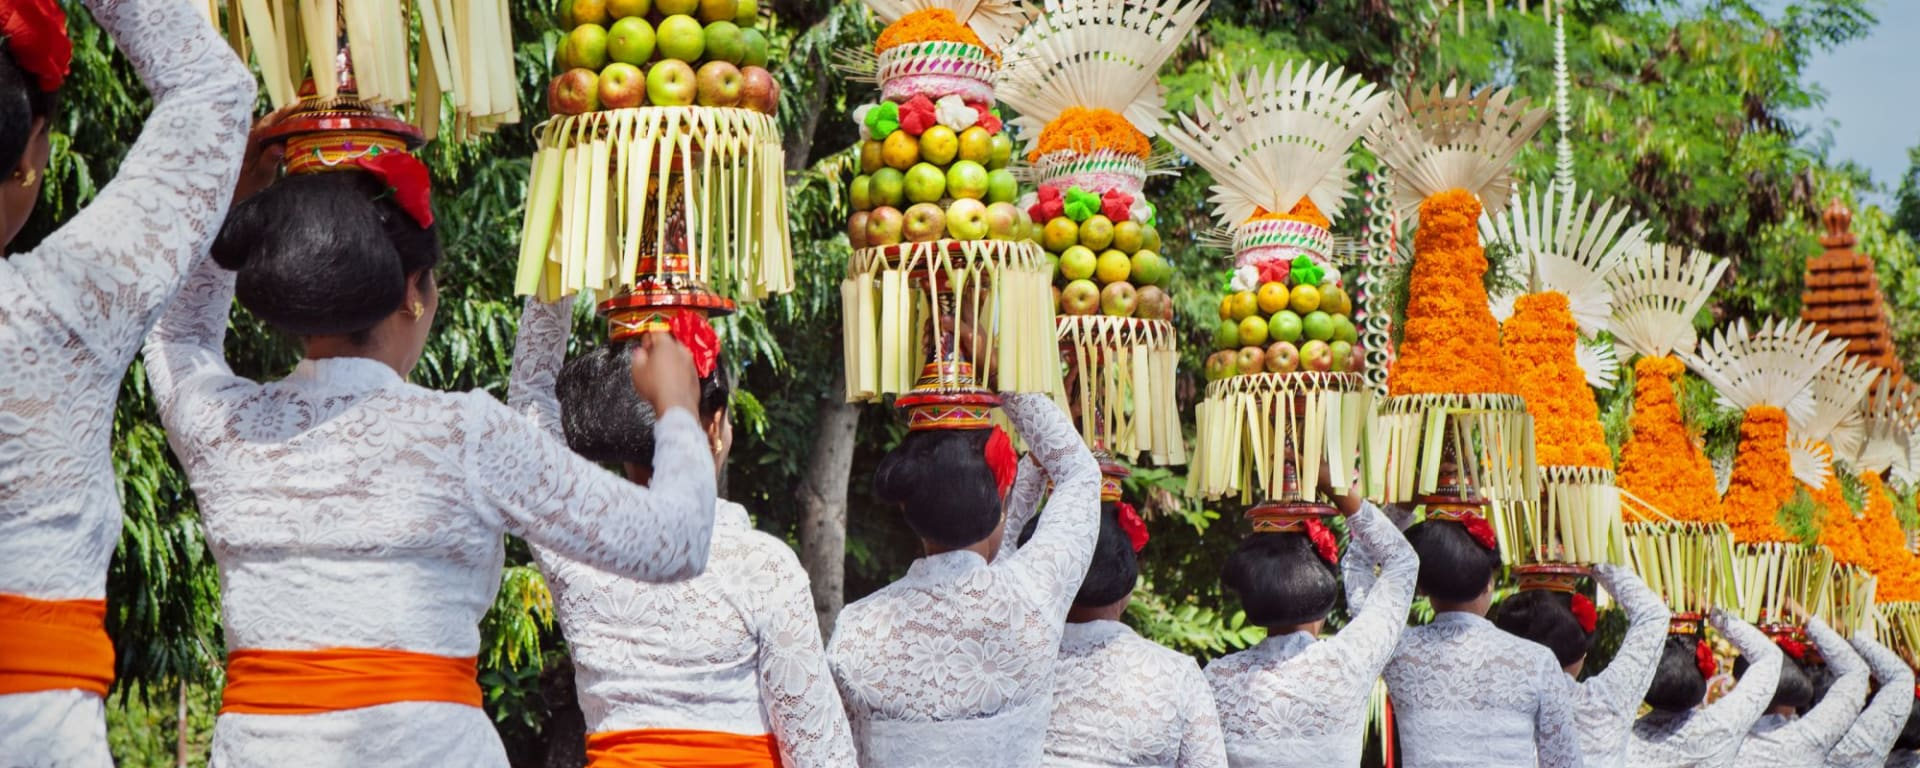 Java-Bali für Geniesser ab Yogyakarta: Bali Procession